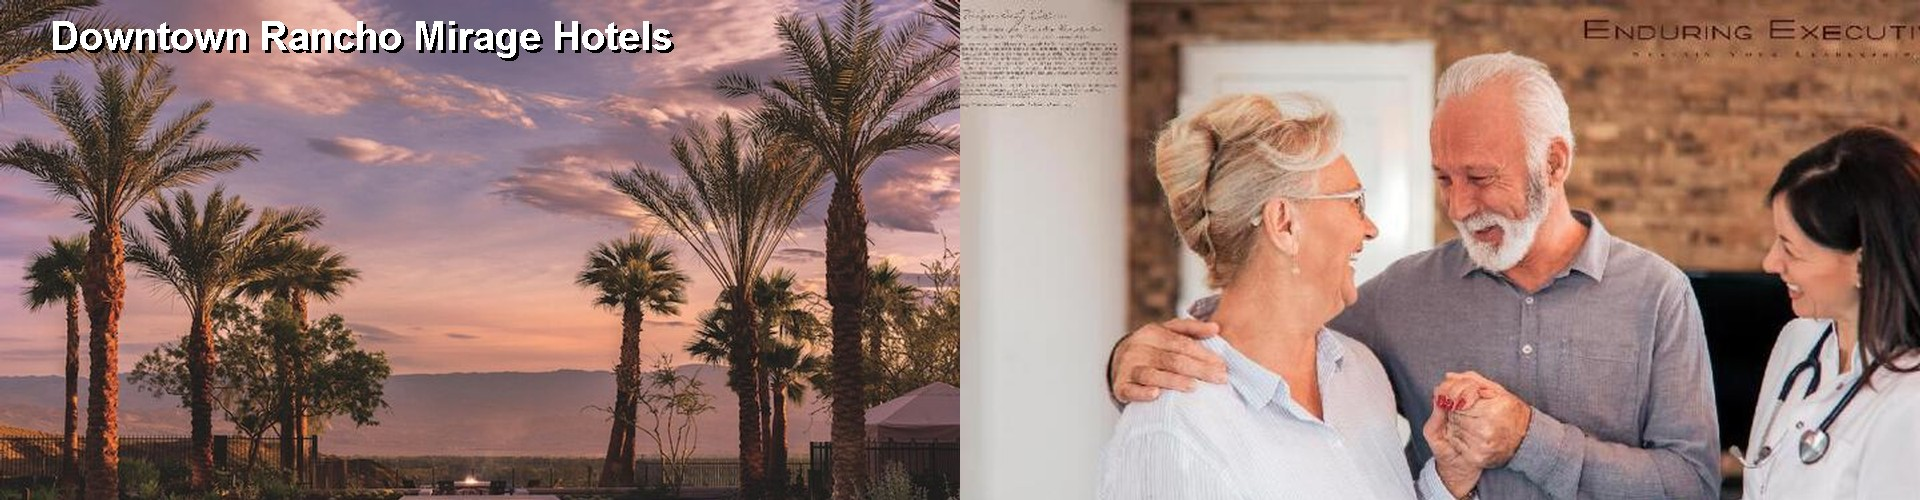 46 Hotels Near Downtown Rancho Mirage Ca